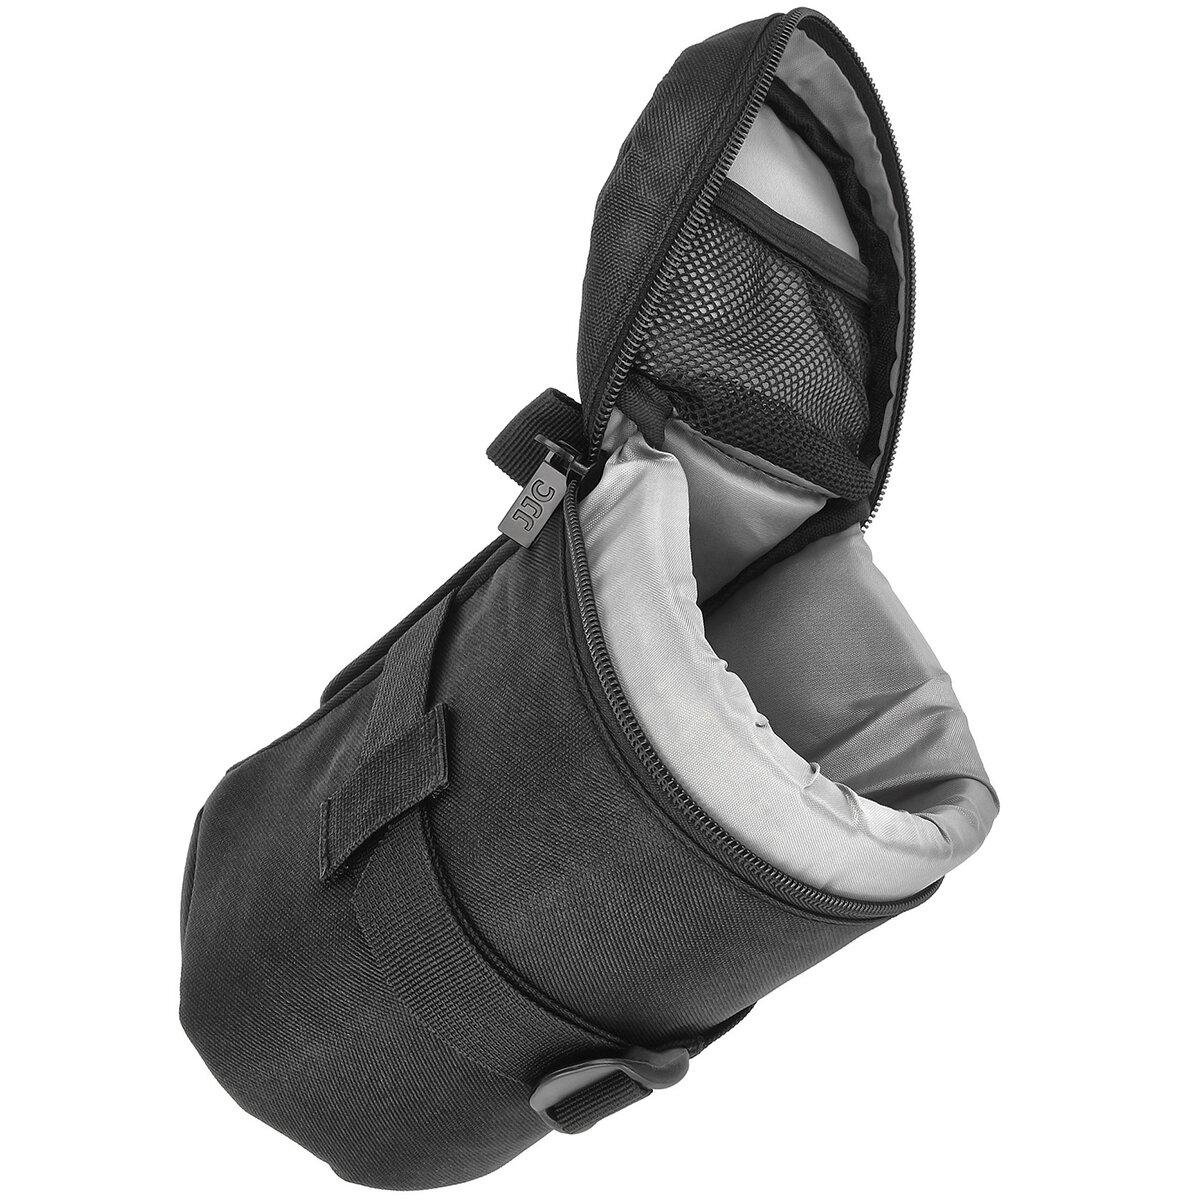 JJC Objektivtasche Objektivköcher Objektivbeutel für Kamera Objektive mit Schultergurt  – Innenmaß 100 x 170 mm – JJC Deluxe Lens Pouch DLP-4